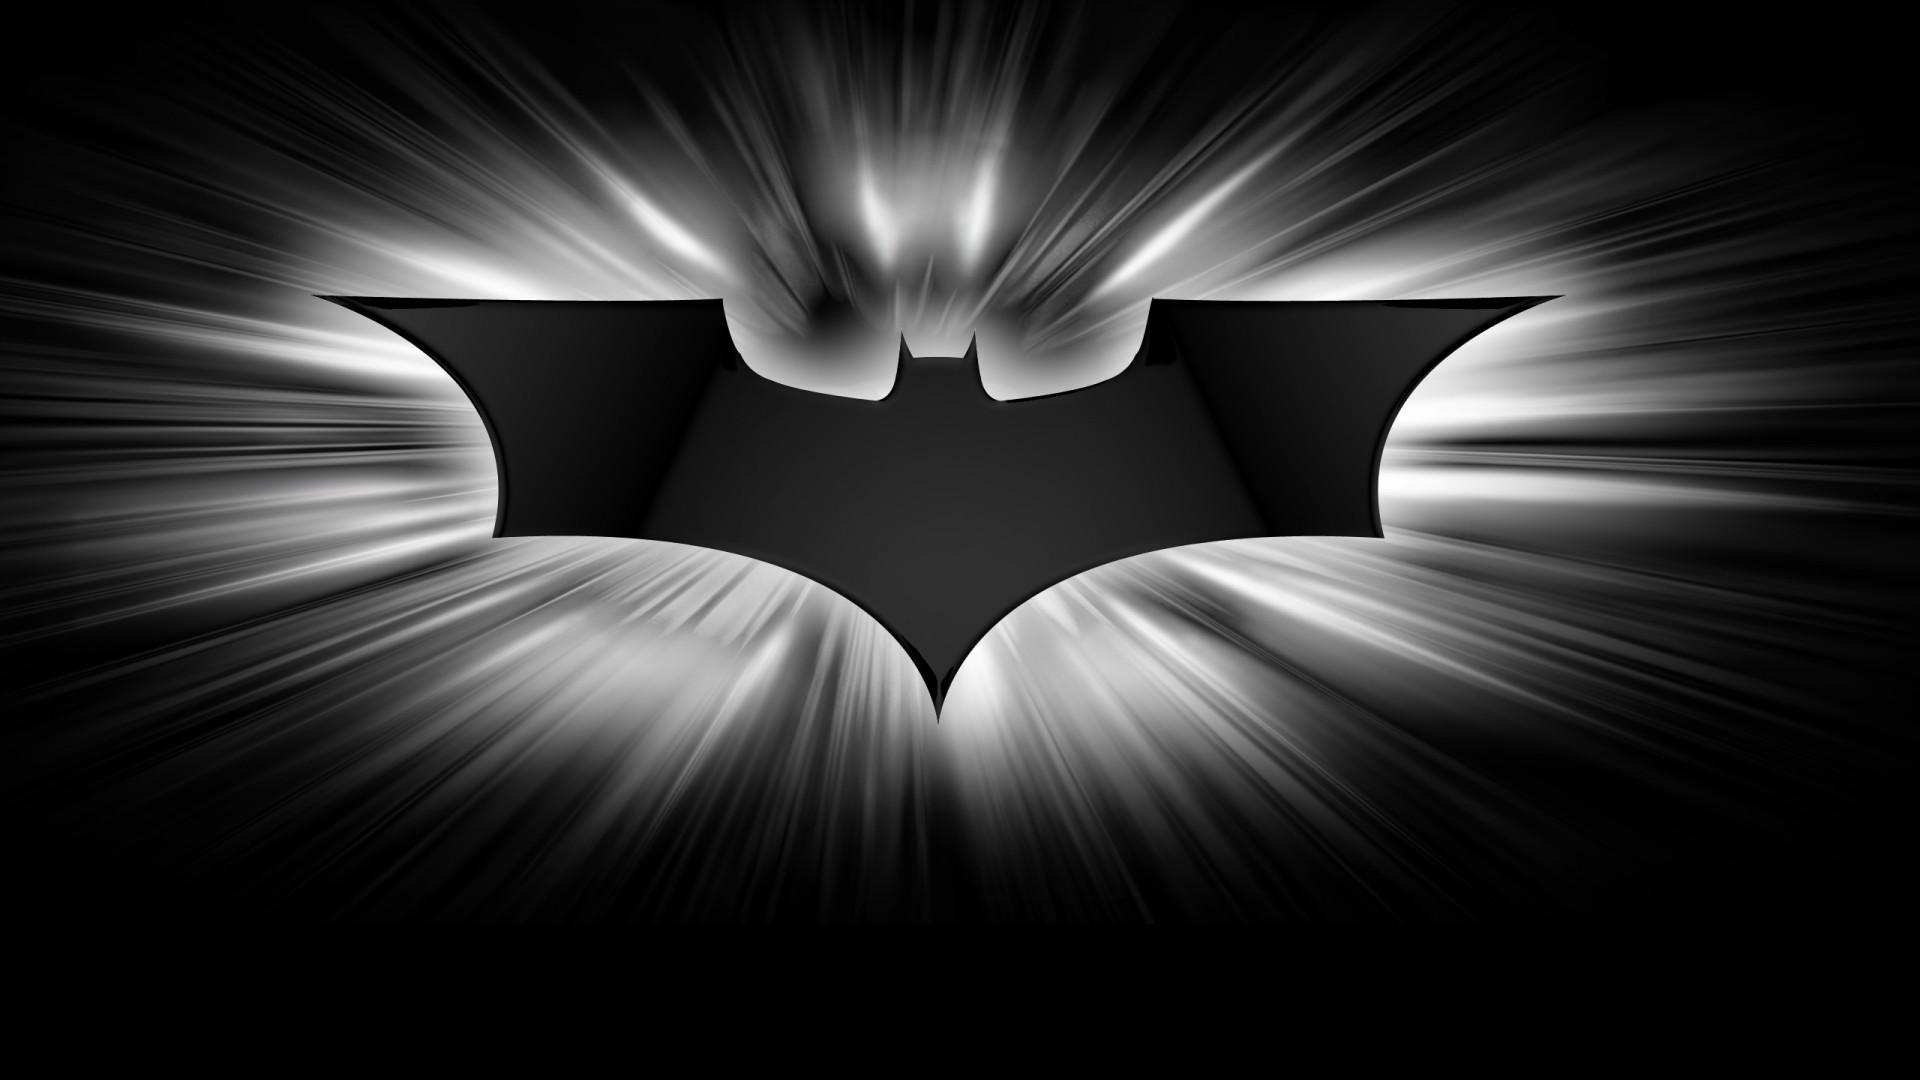 Awesome Batman Bat Symbol Hd Wallpapers